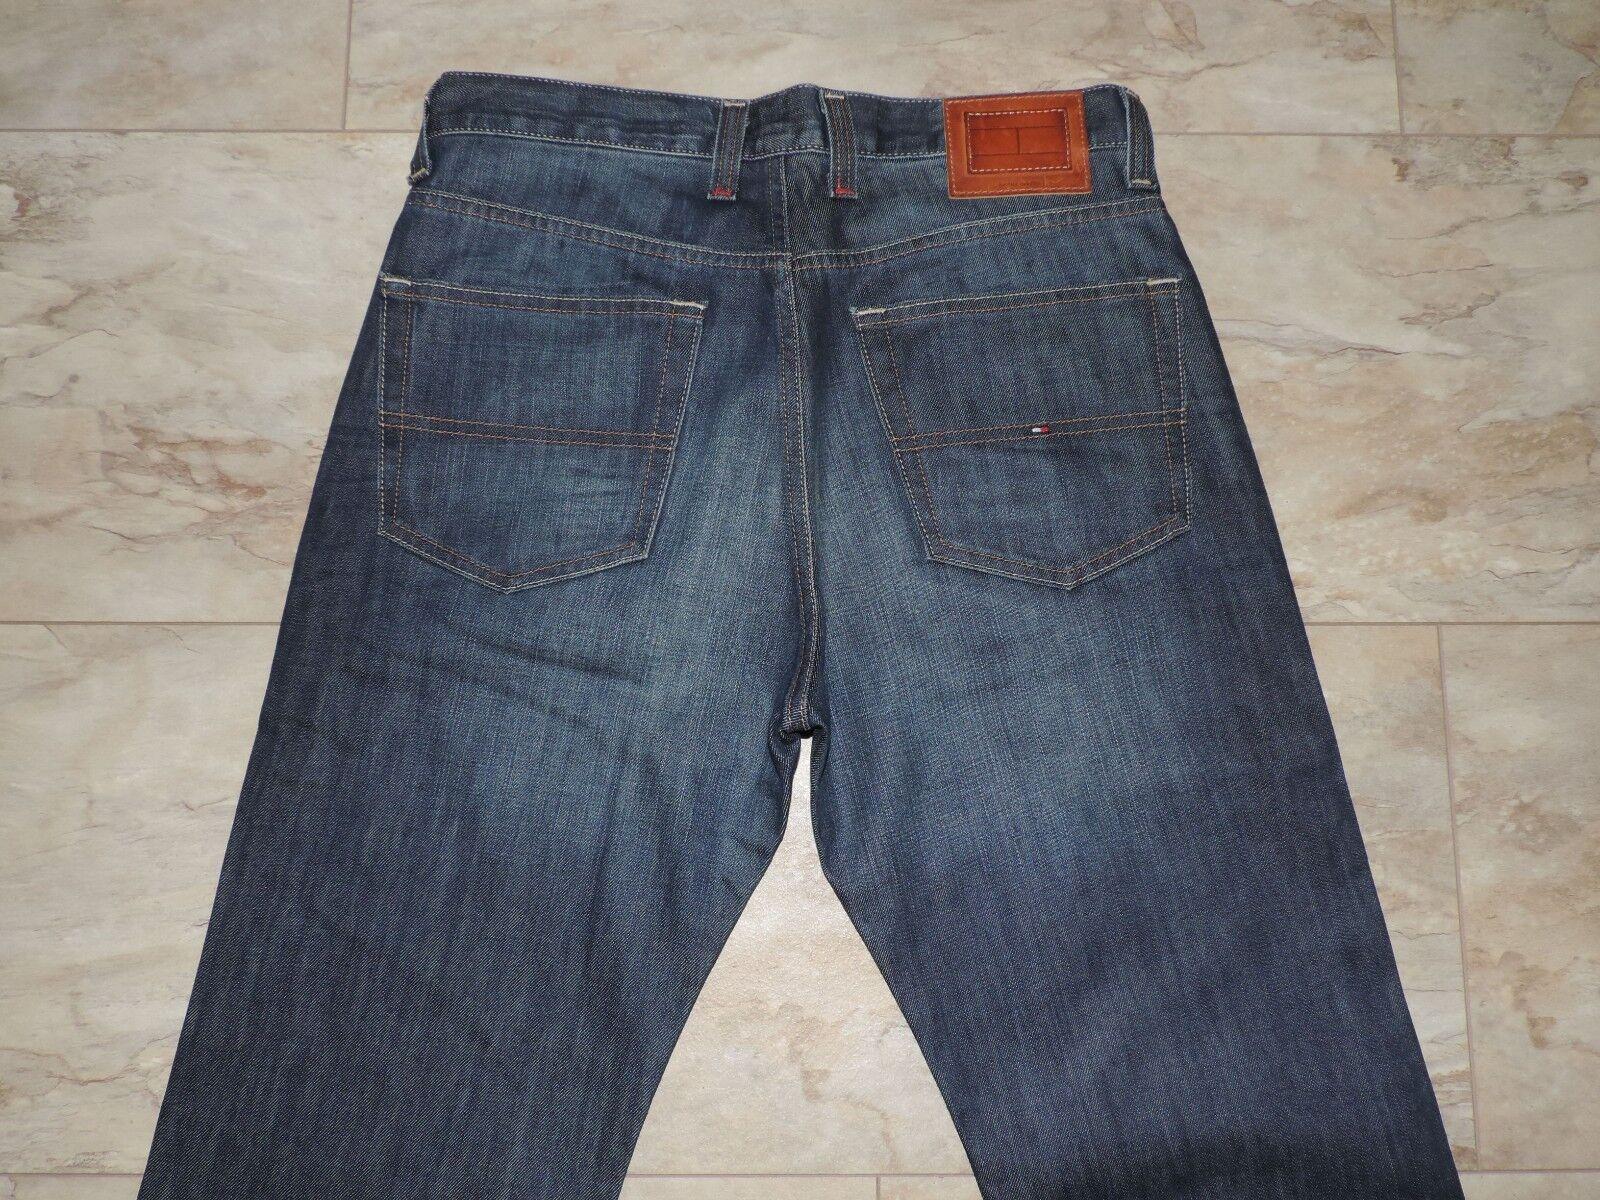 Tommy Hilfiger Madison Herren Jeans Gr. W32 L36 neu